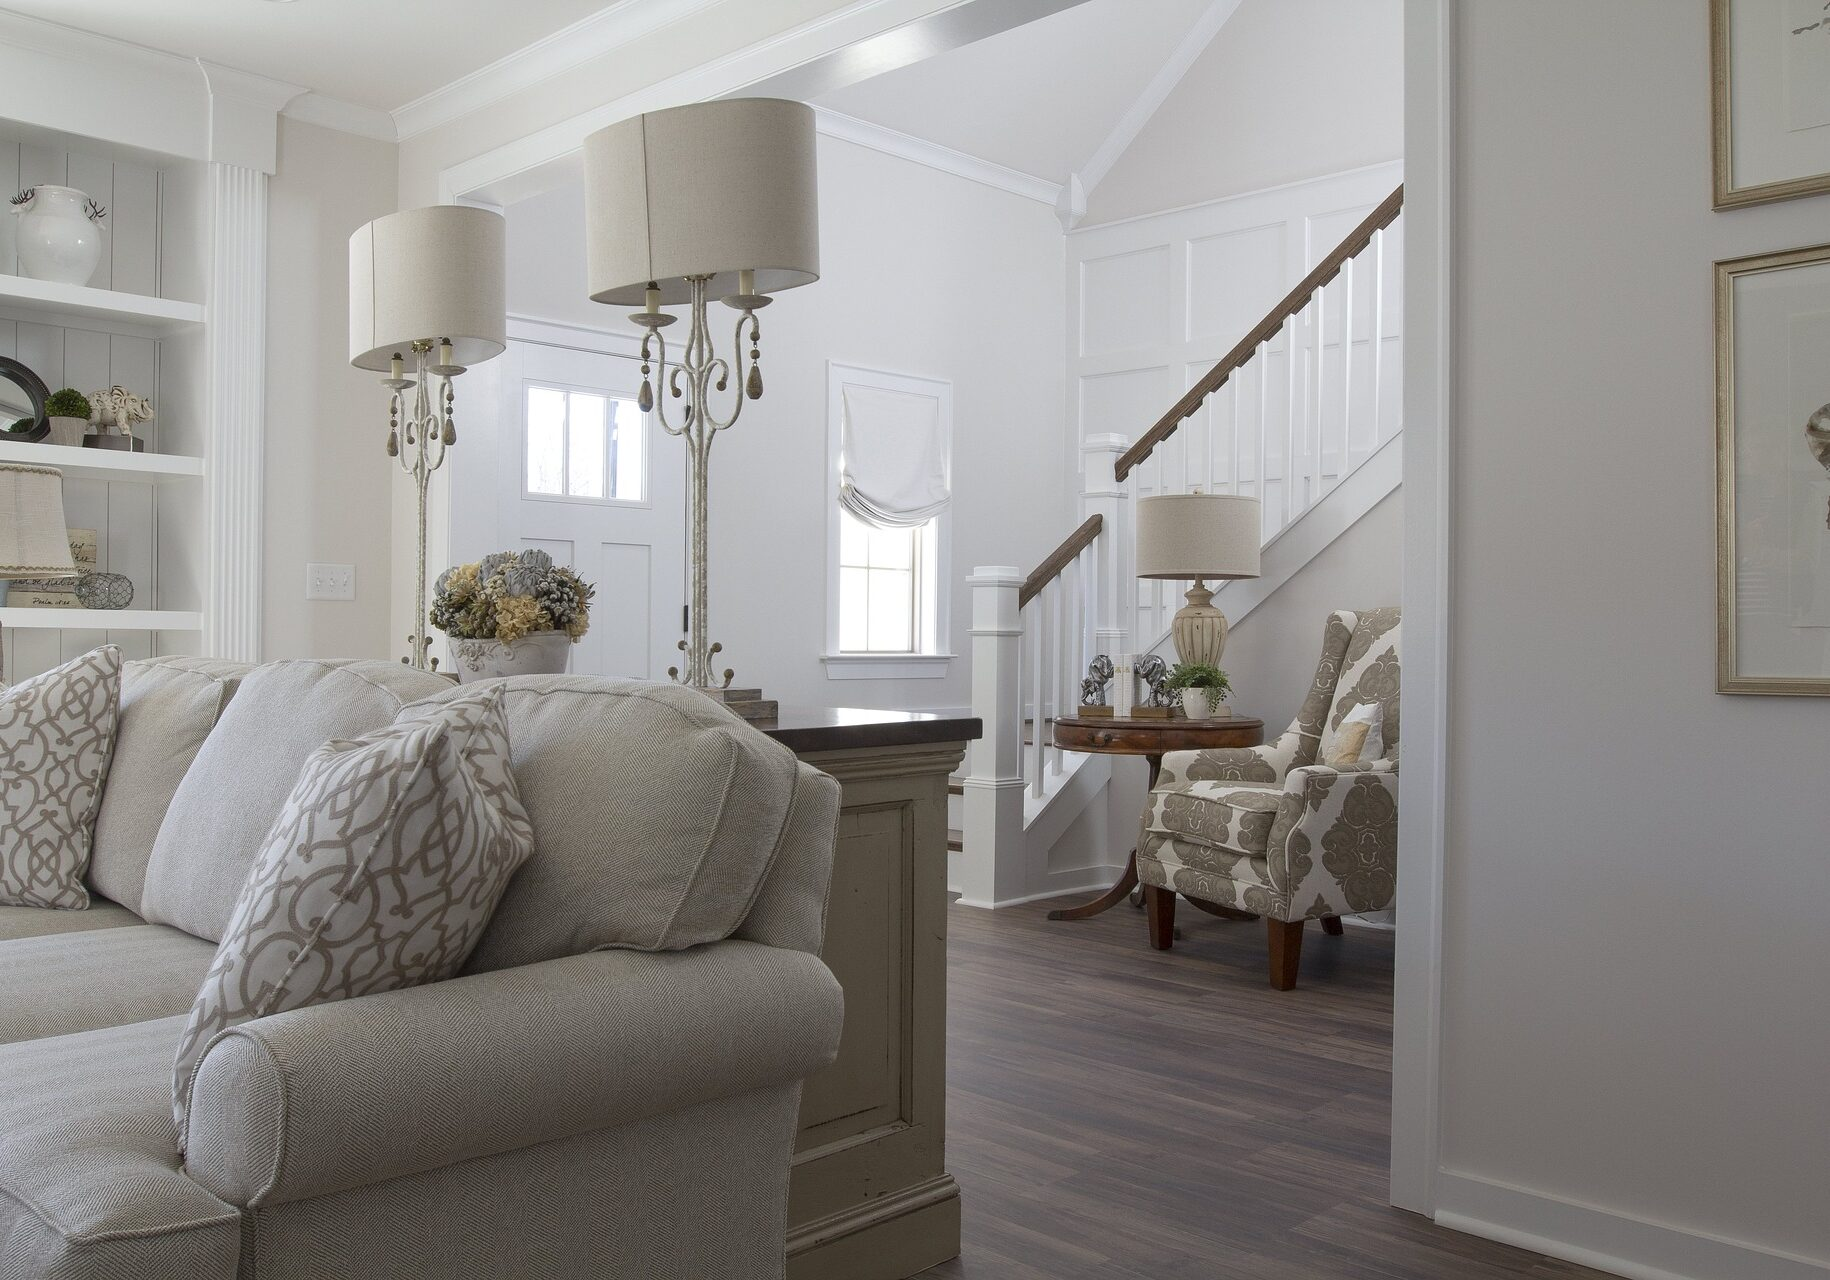 hshc-spring-2021-living-room-2605530_1920